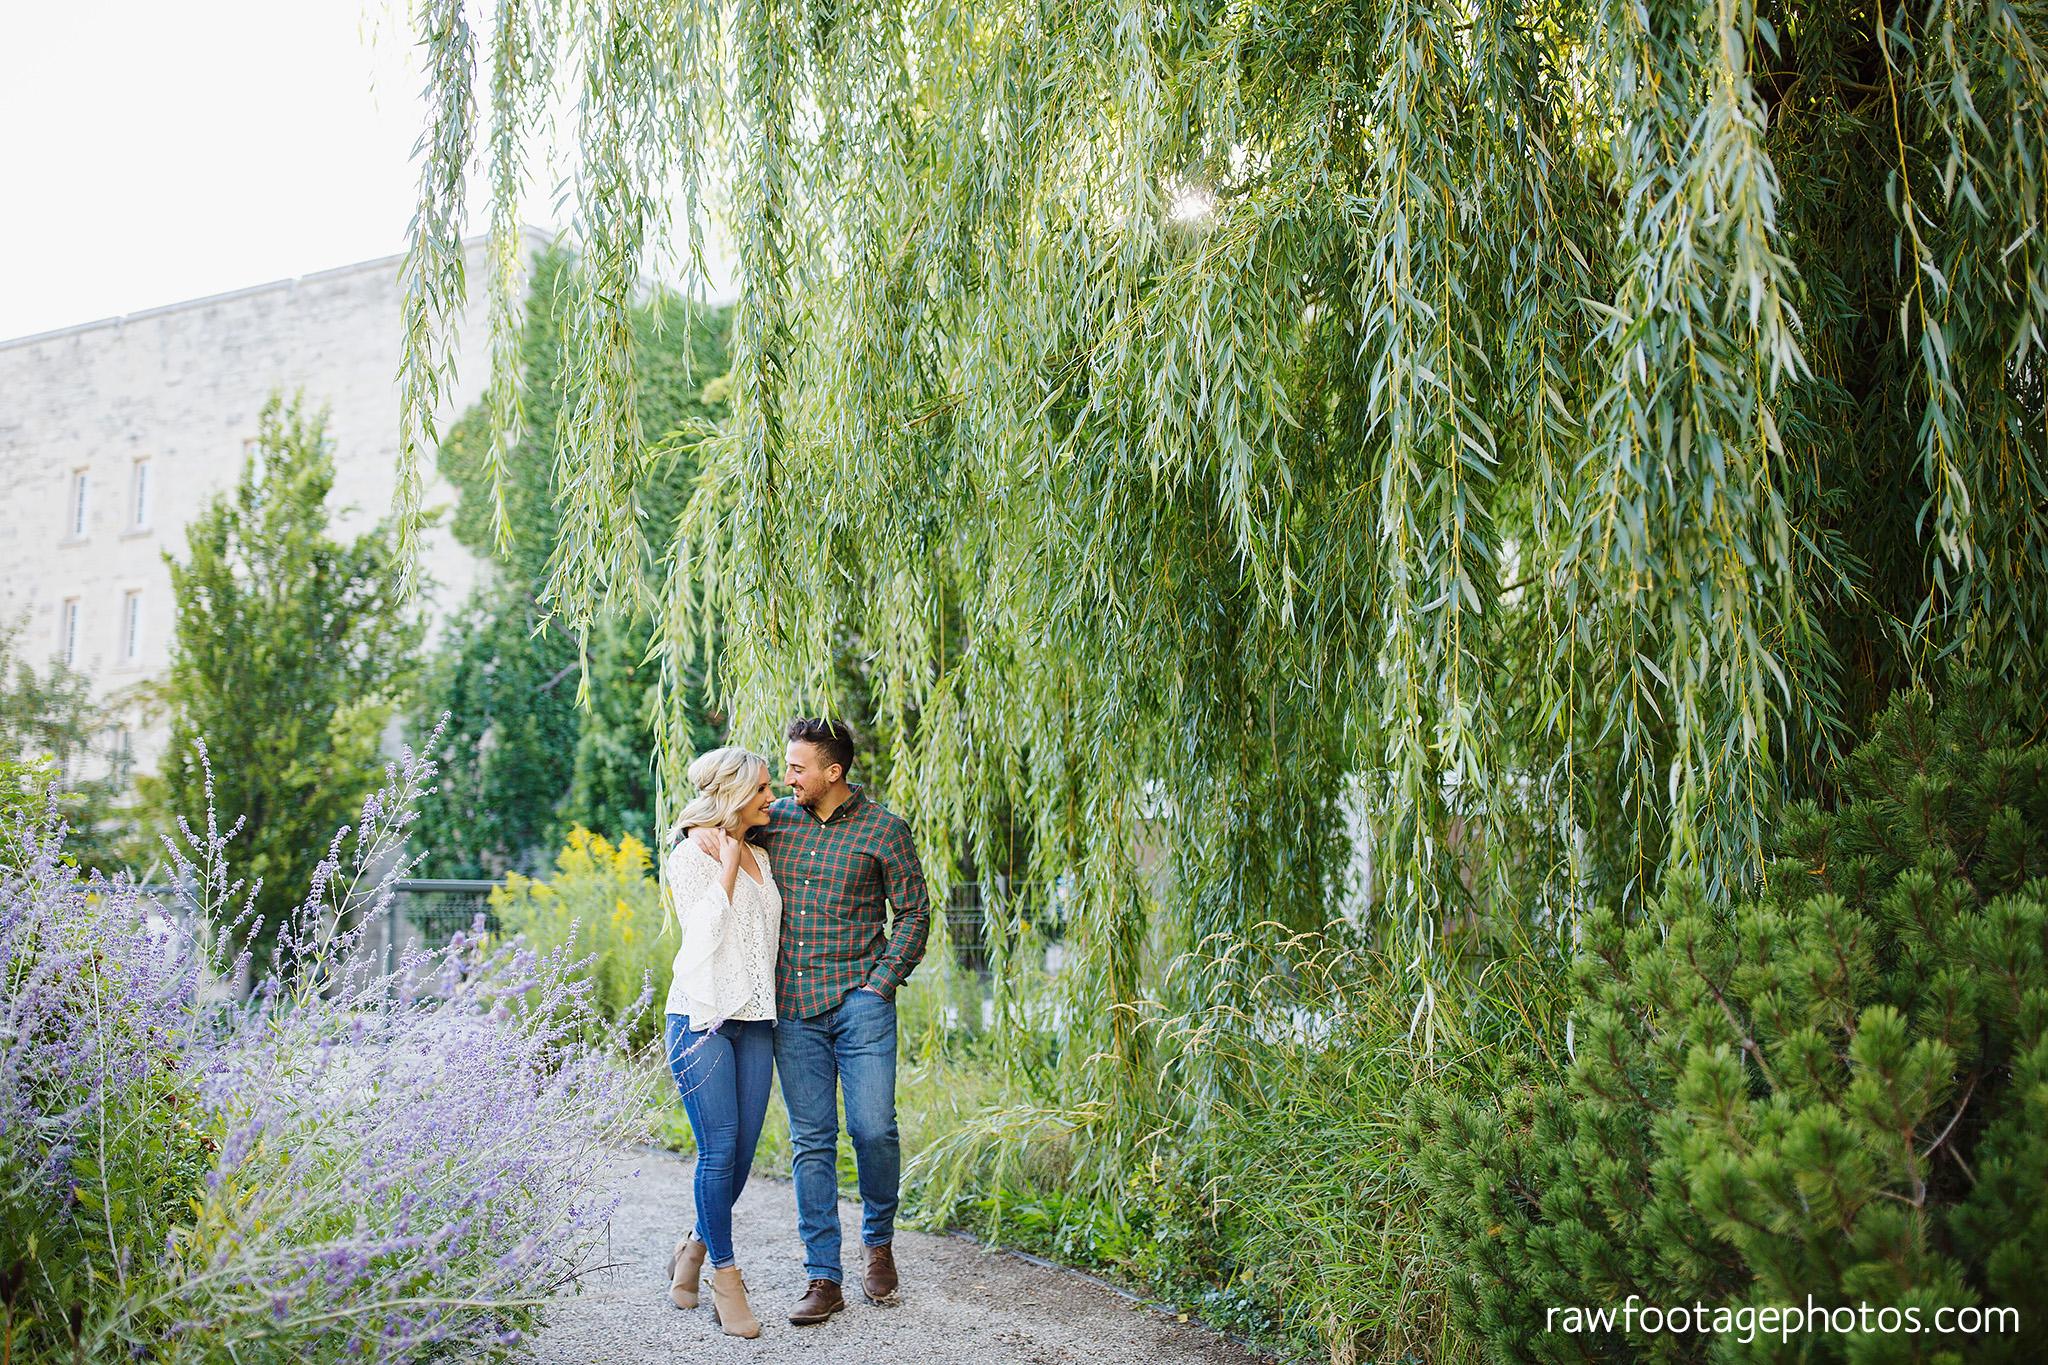 london_ontario_wedding_photographer-raw_footage_photography-engagement_session-uwo-campus-gibbons_park-woods006.jpg